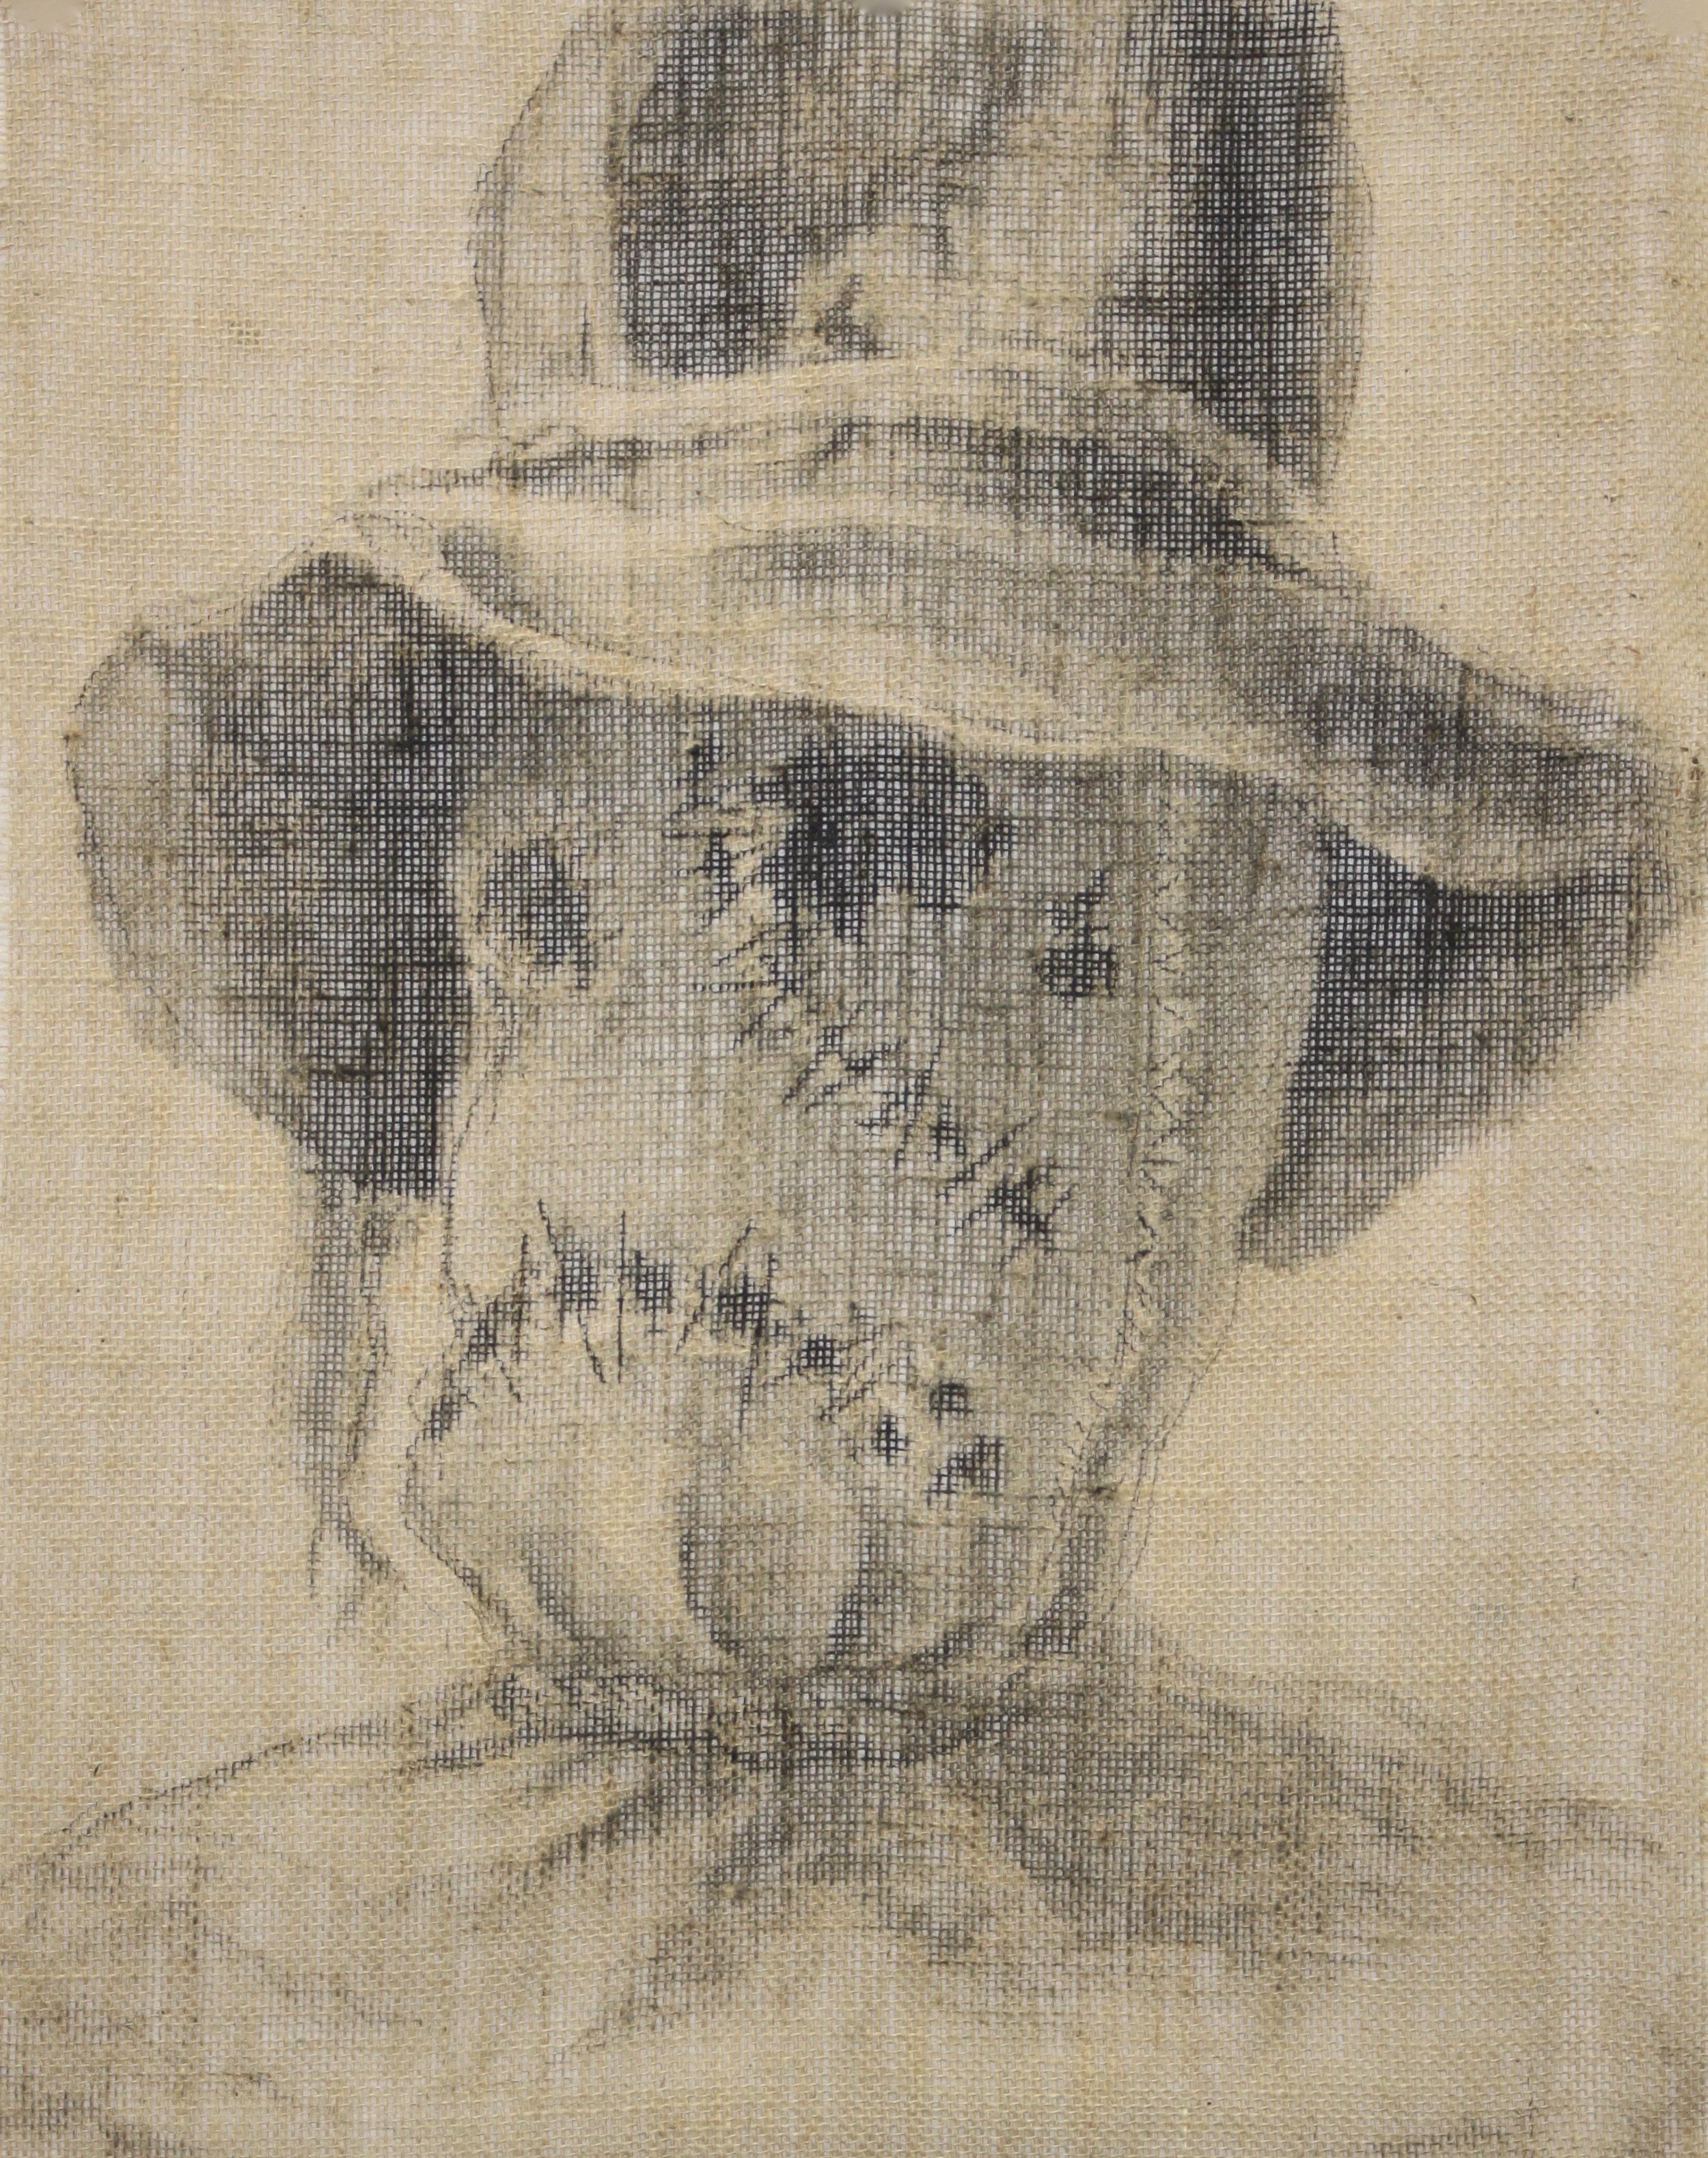 Scarecrow: 2